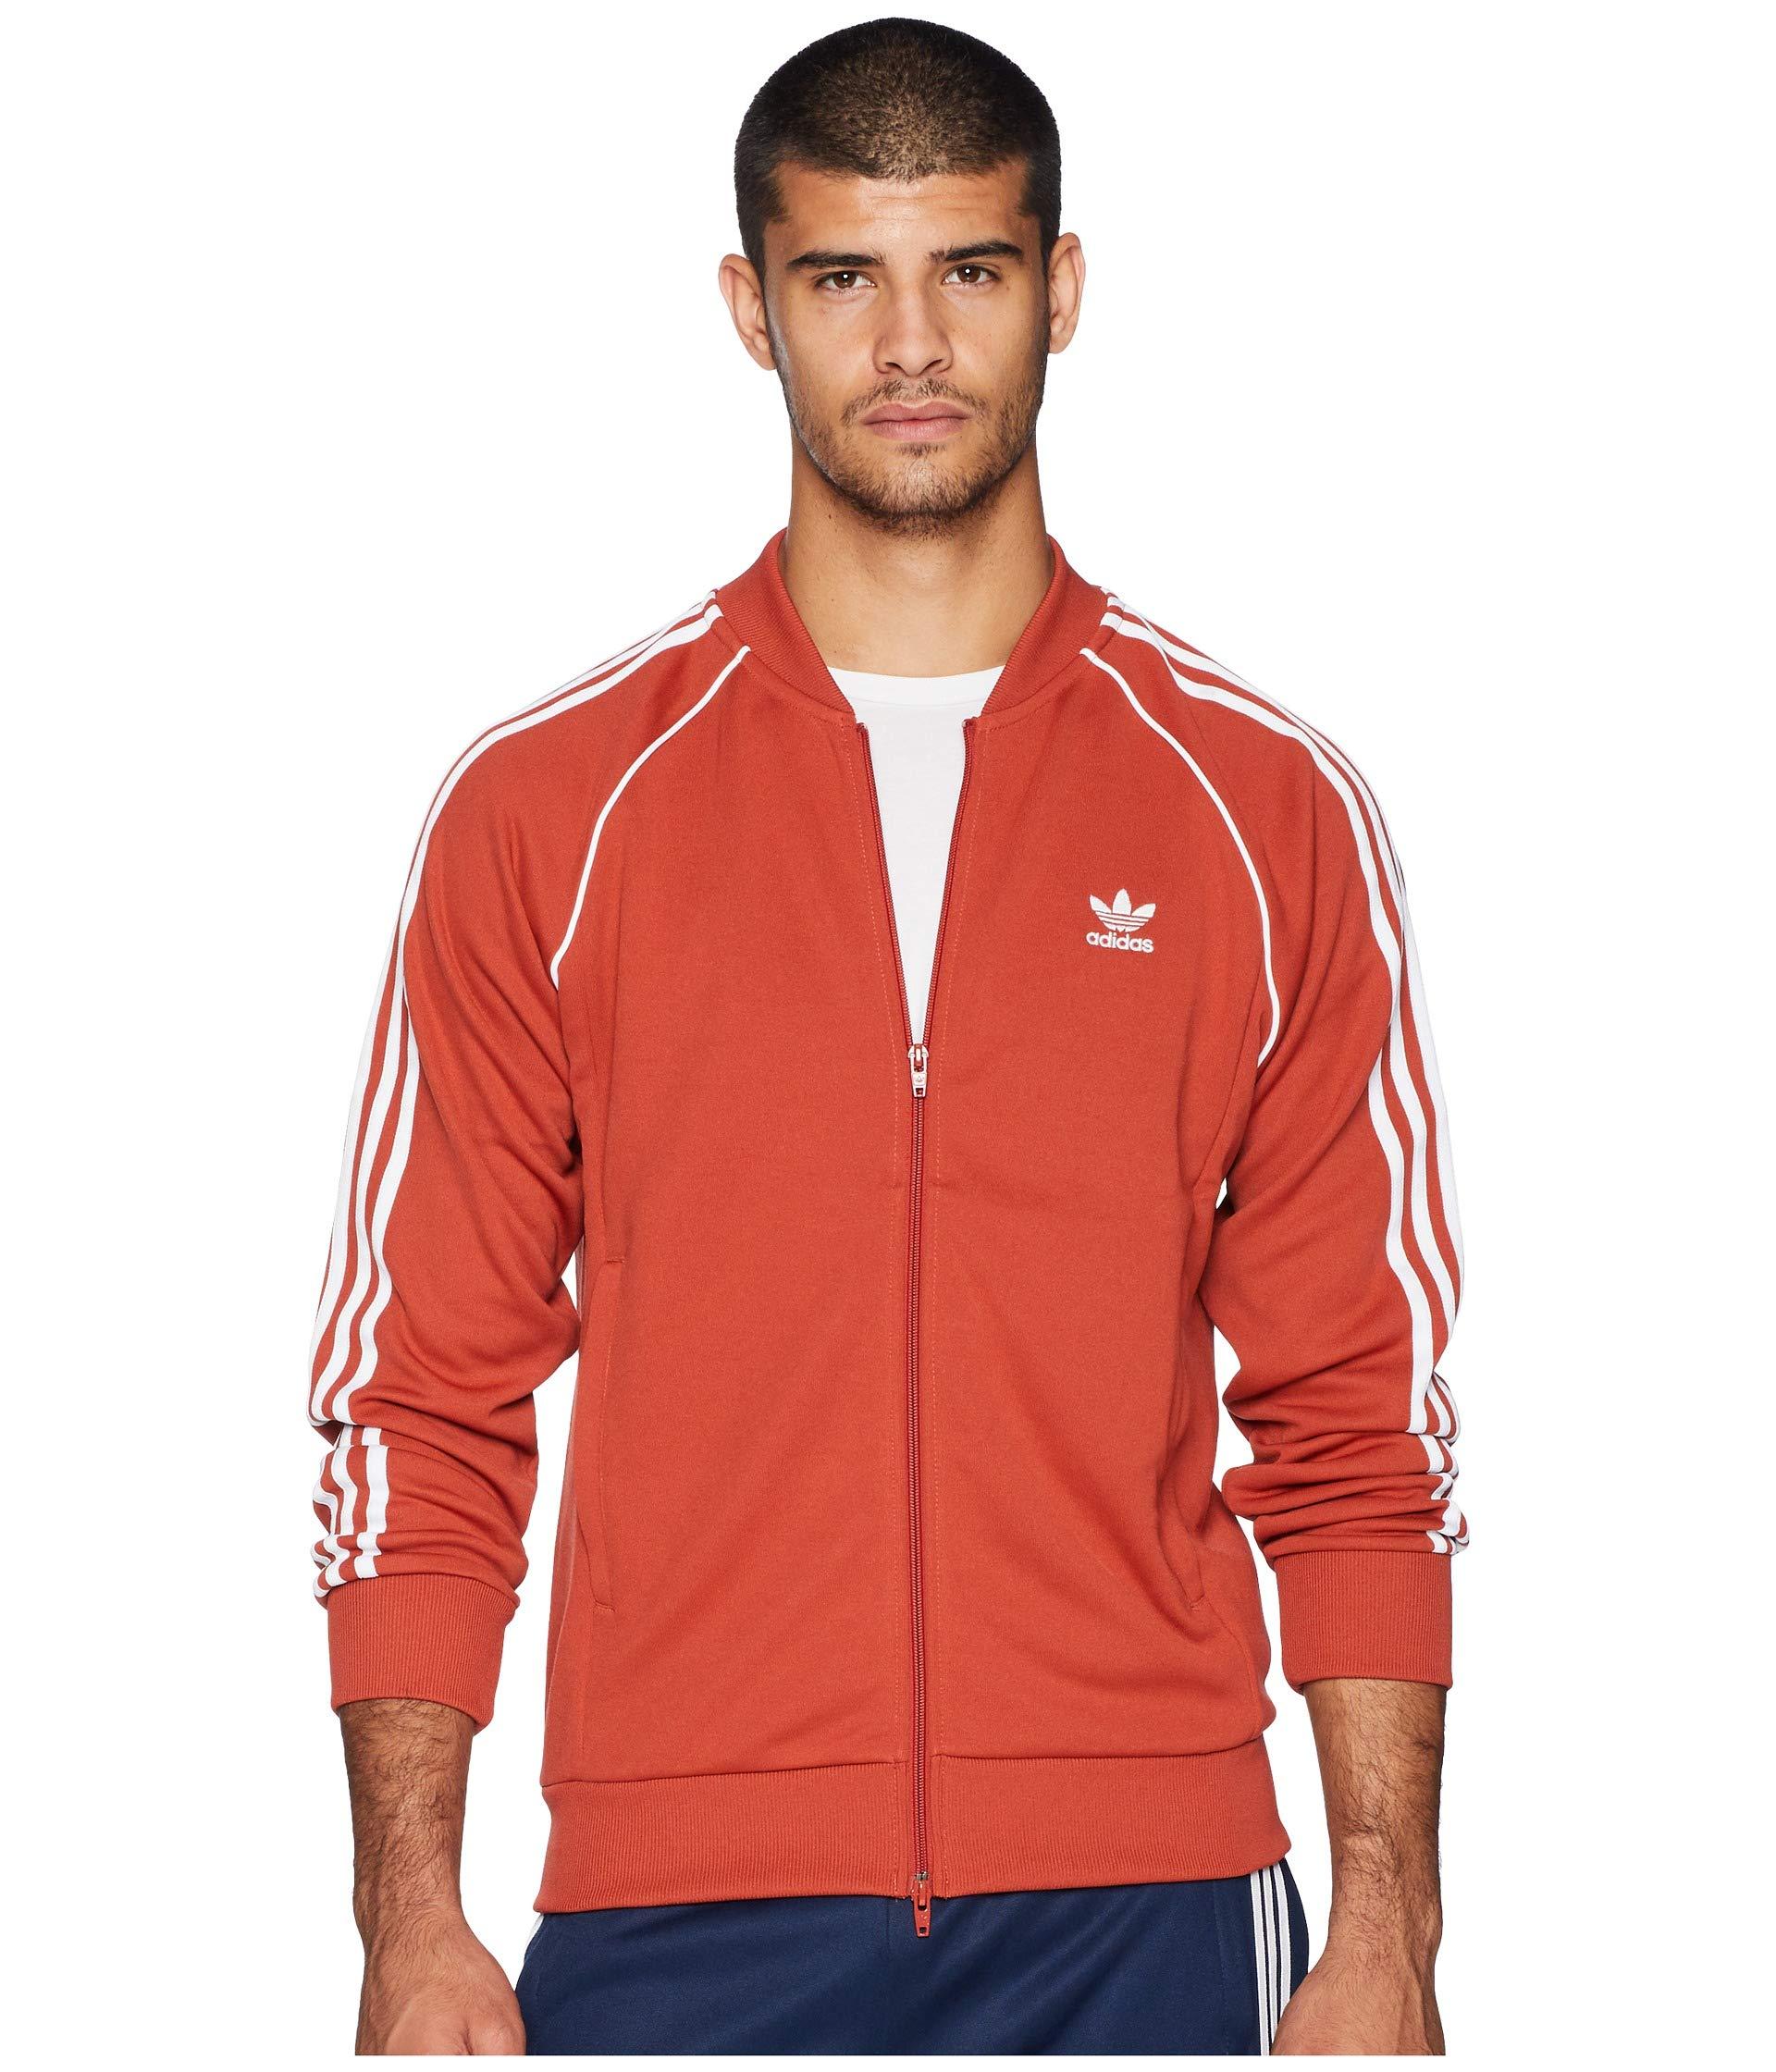 Originals Sst Track Shift Orange Top Adidas qvaw1pW